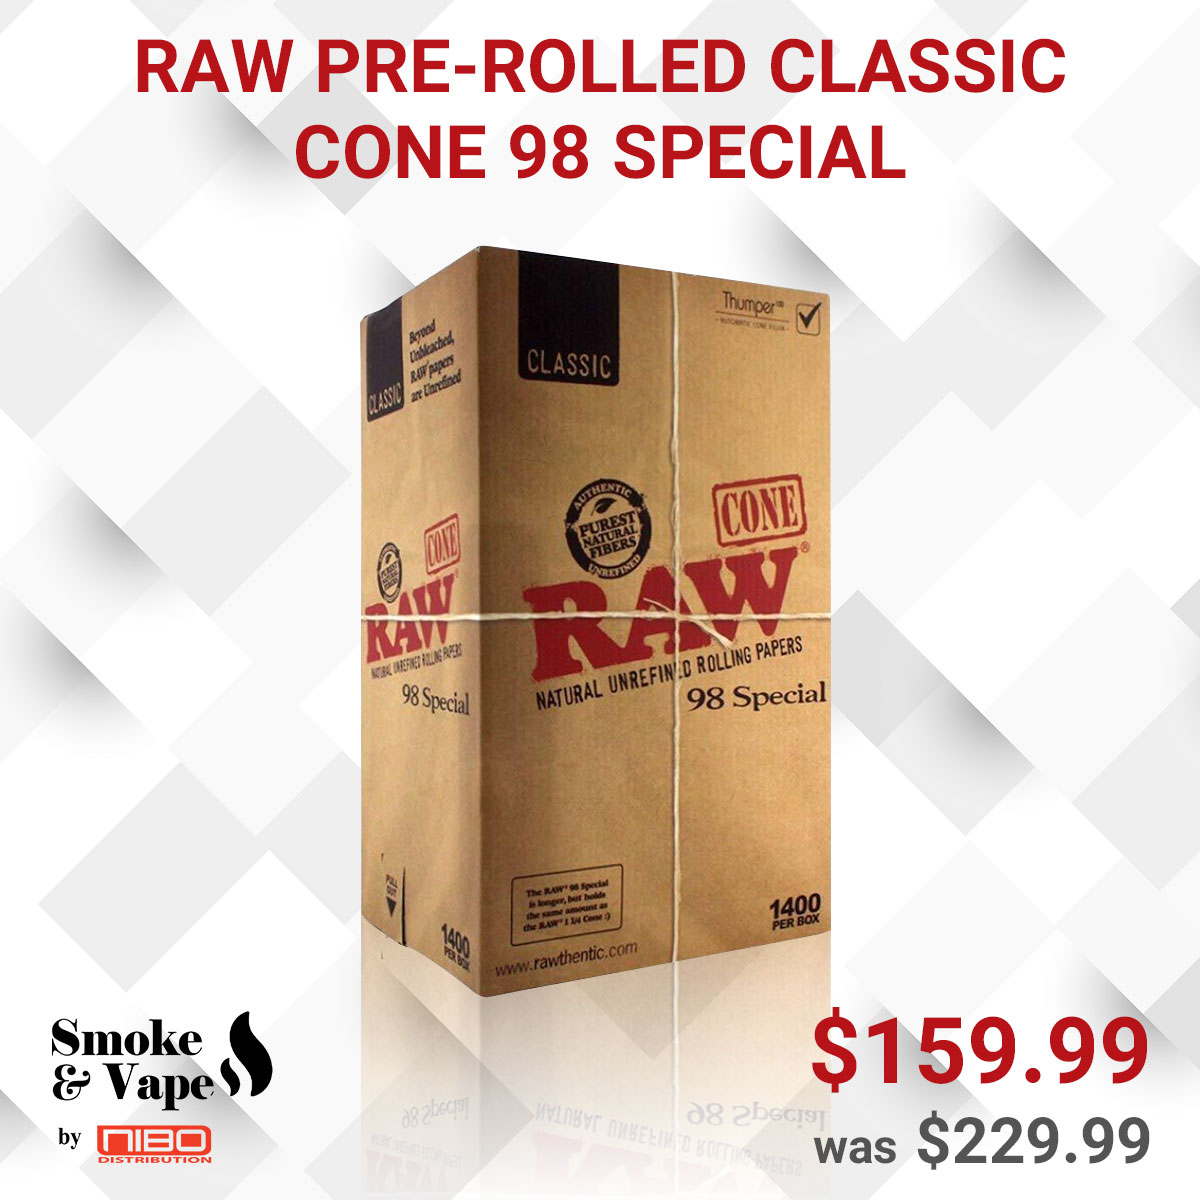 RAW PRE-ROLLED CLASSIC CONE 98 SPECIAL 1400/BOX  https://t.co/JftonyI2tJ  #RAWPREROLLED #CLASSIC_CONE #RawTubes #raw_rolling #tray #rawtray #smokeVape #smoking_accessory #rawtraymini #mini #mini_tray #canada #smoking #vaping #smokefans #vape #toronto_smoke_accessory https://t.co/KIGCQ2F202